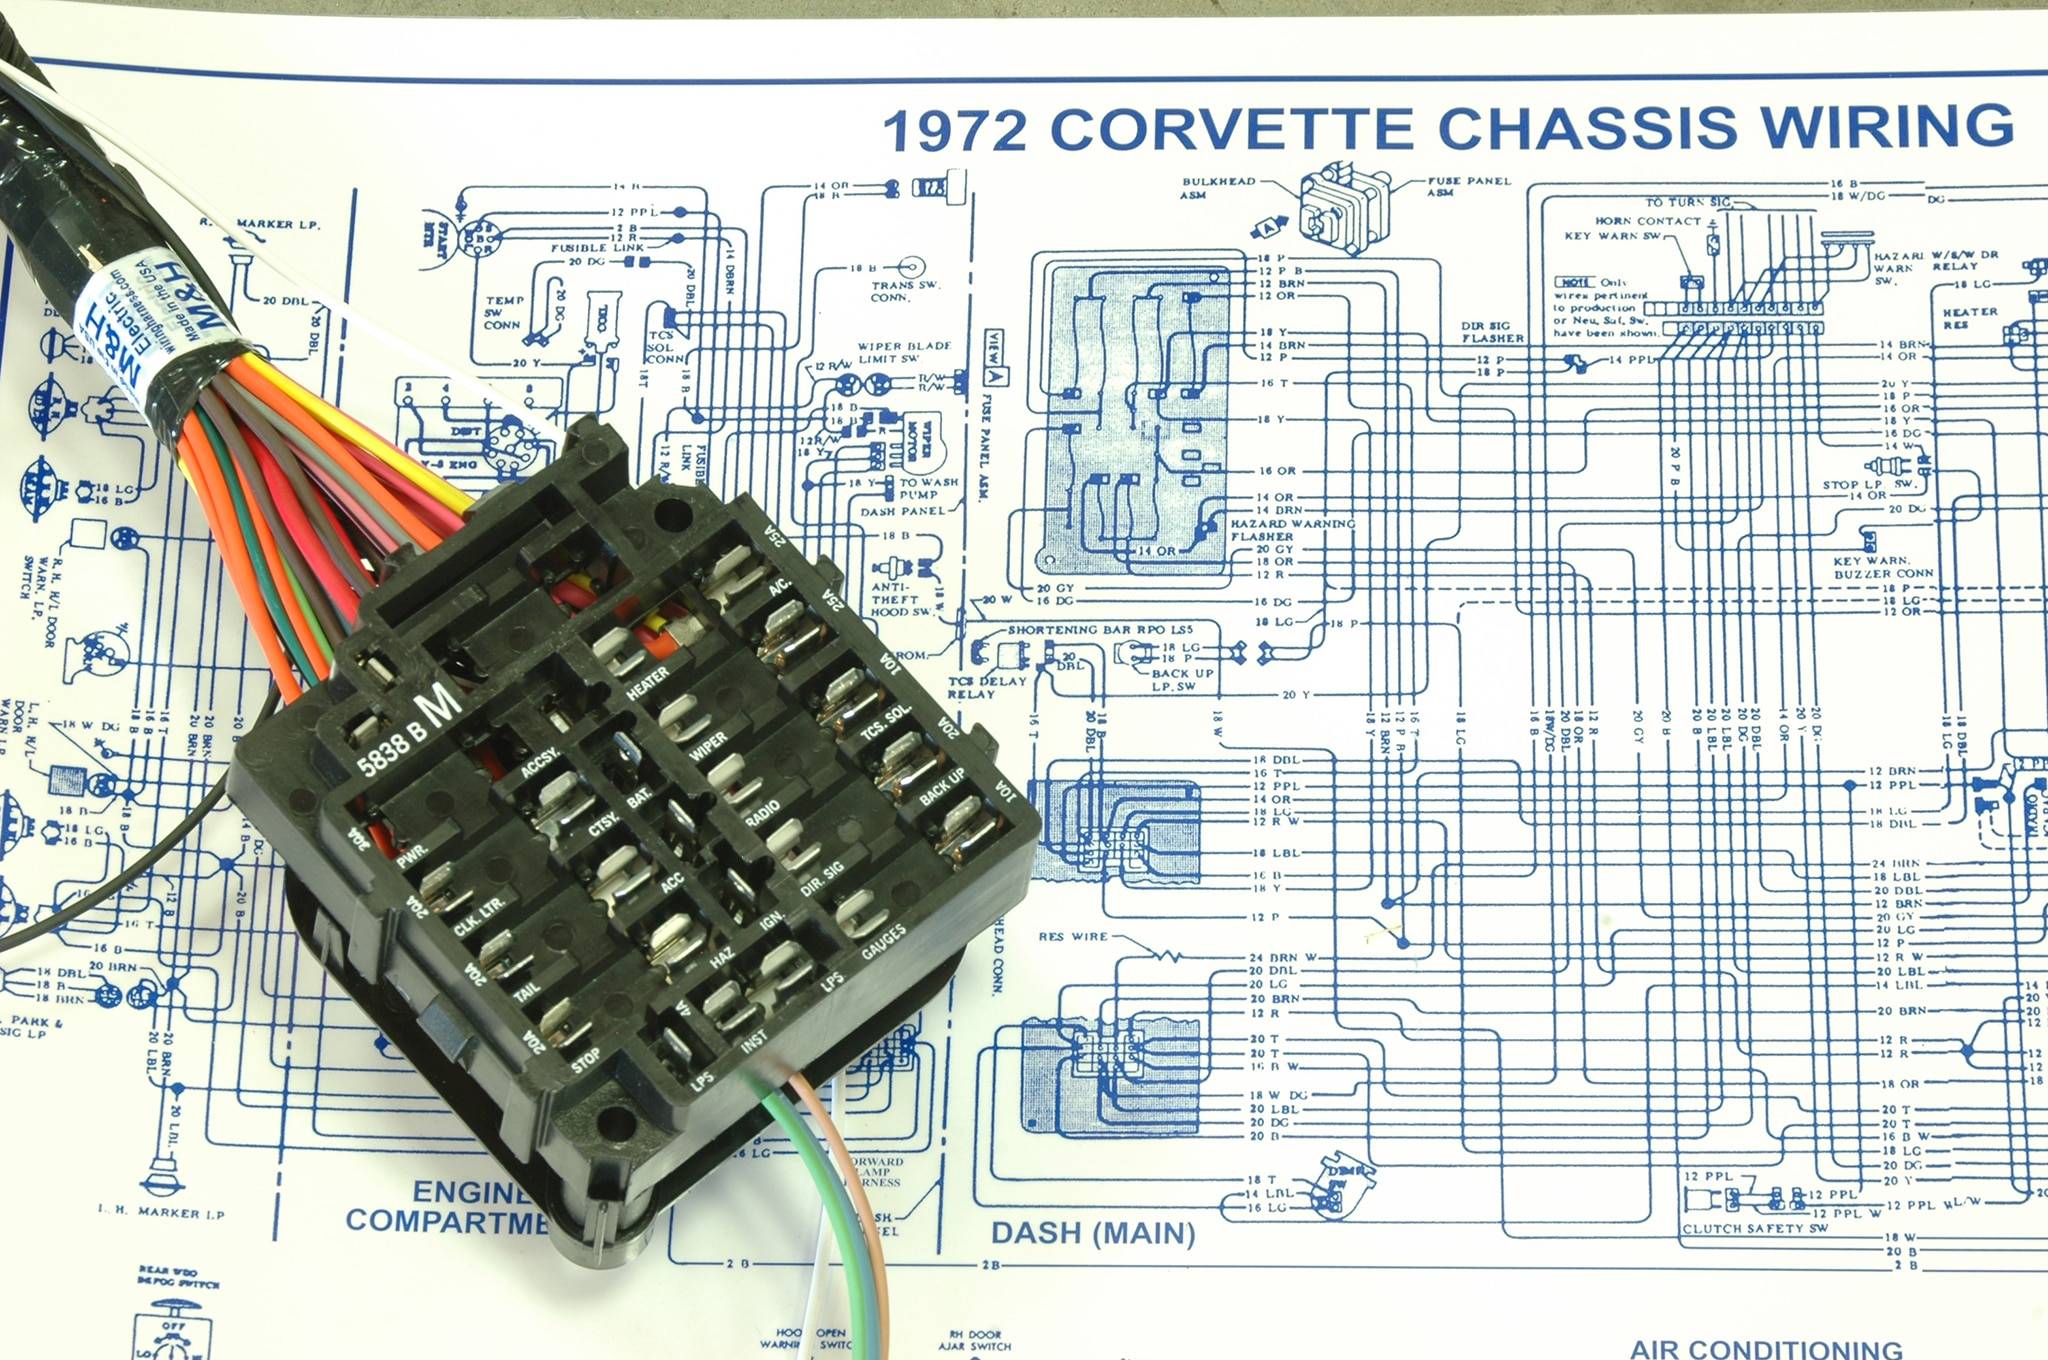 hight resolution of 1972 corvette scarlett project car dash wiring harness installation 72 chevelle wiring diagram 1972 corvette dash